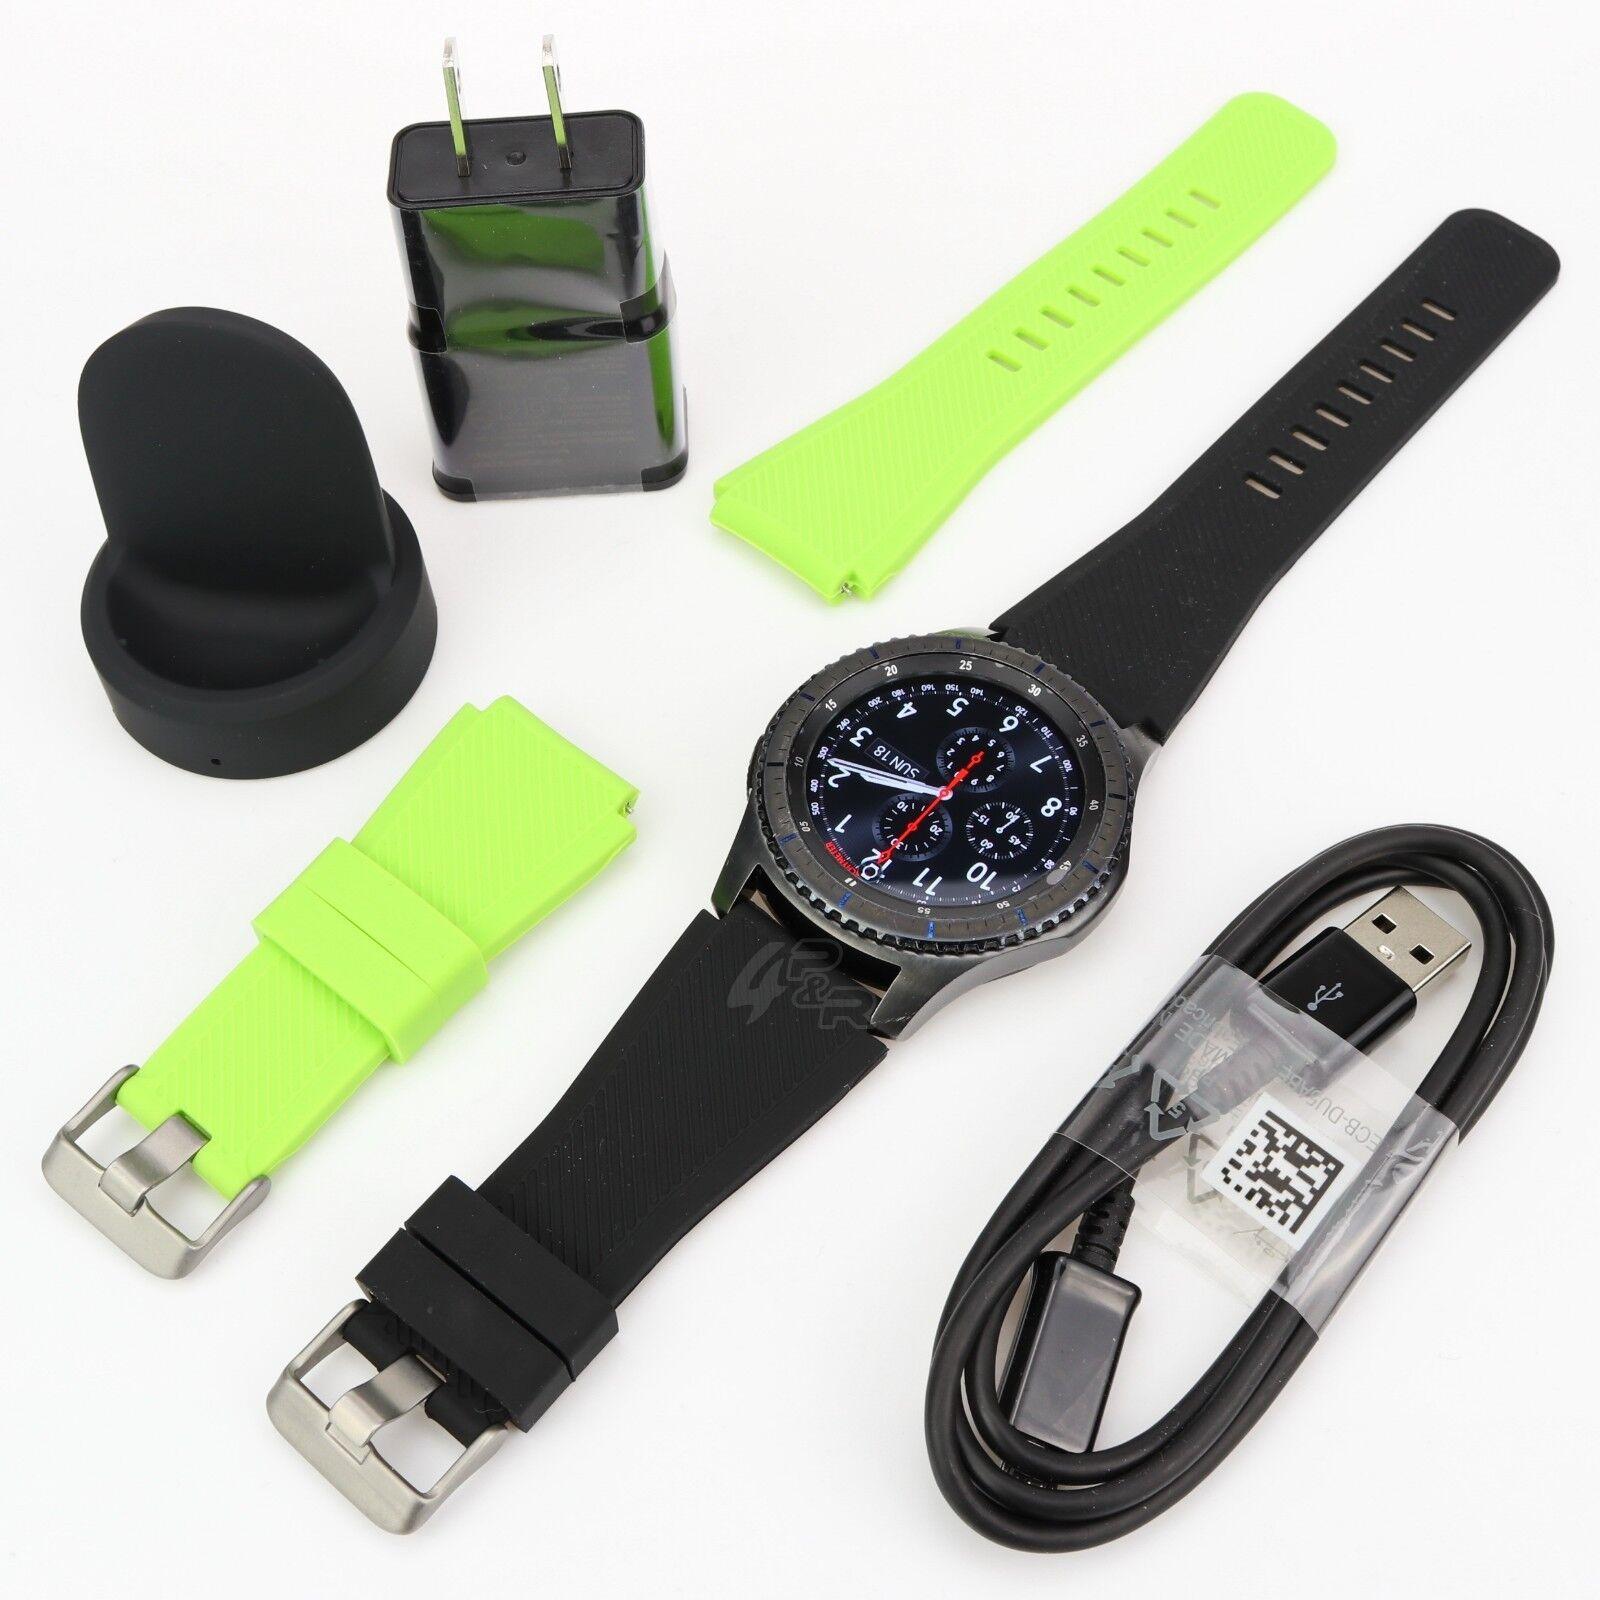 Samsung Gear S3 SM-R760 Frontier Wi-fi Smart Watch w/ 2 Generic Size Bands